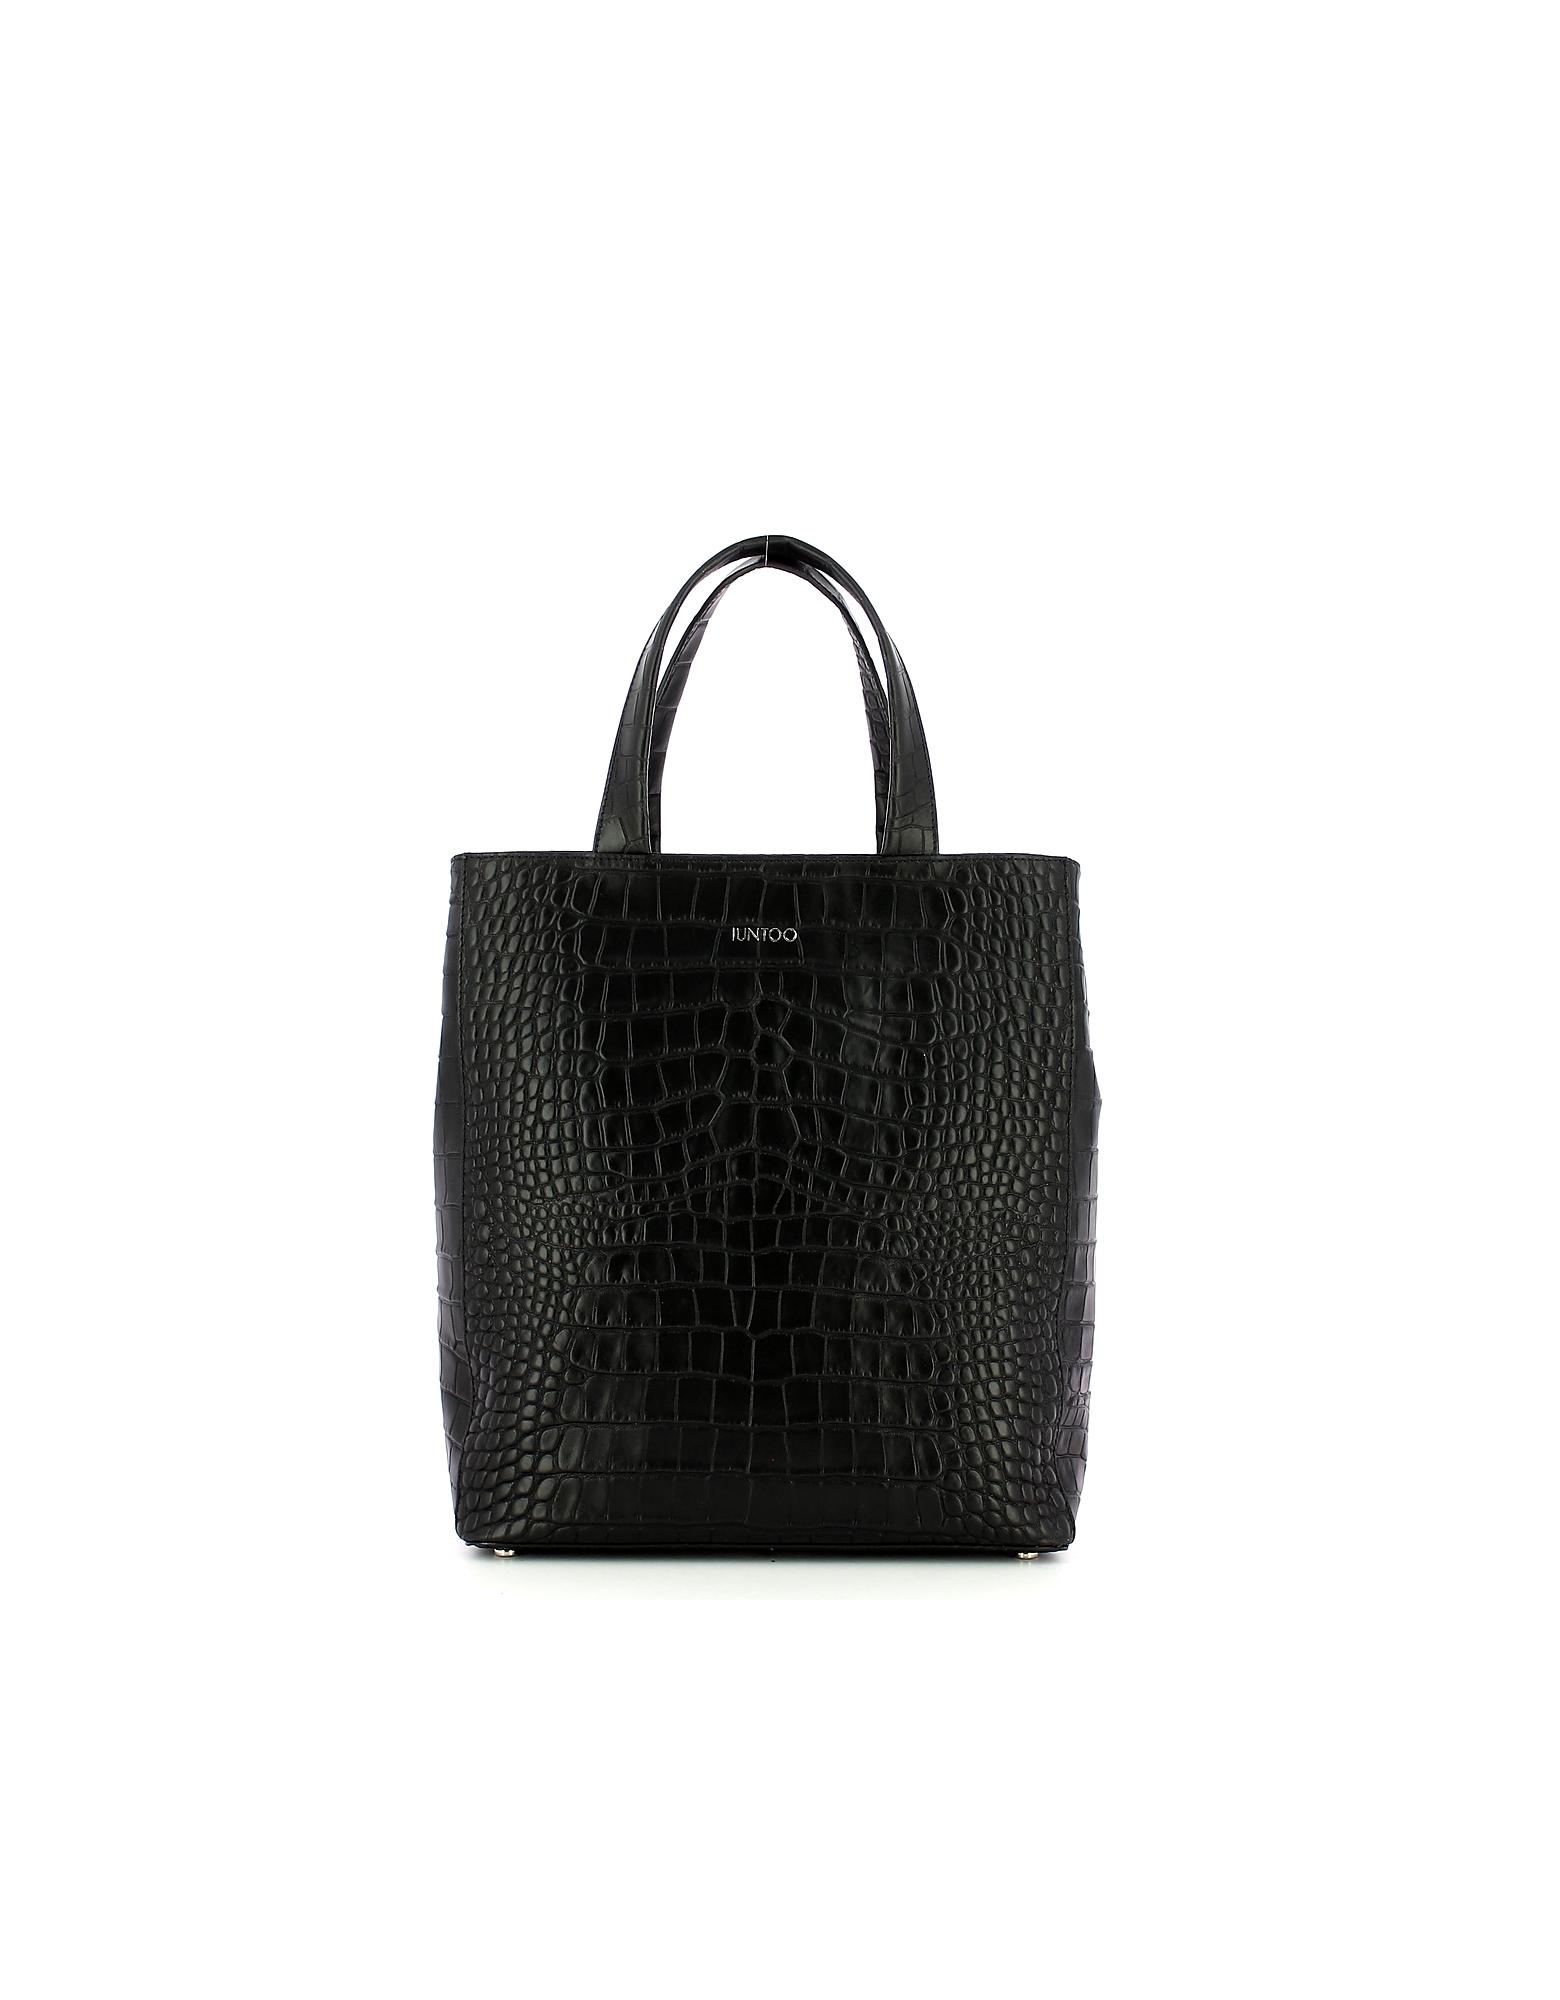 IUNTOO Designer Handbags, Black Croco Embossed Leather Gioia Tote Bag